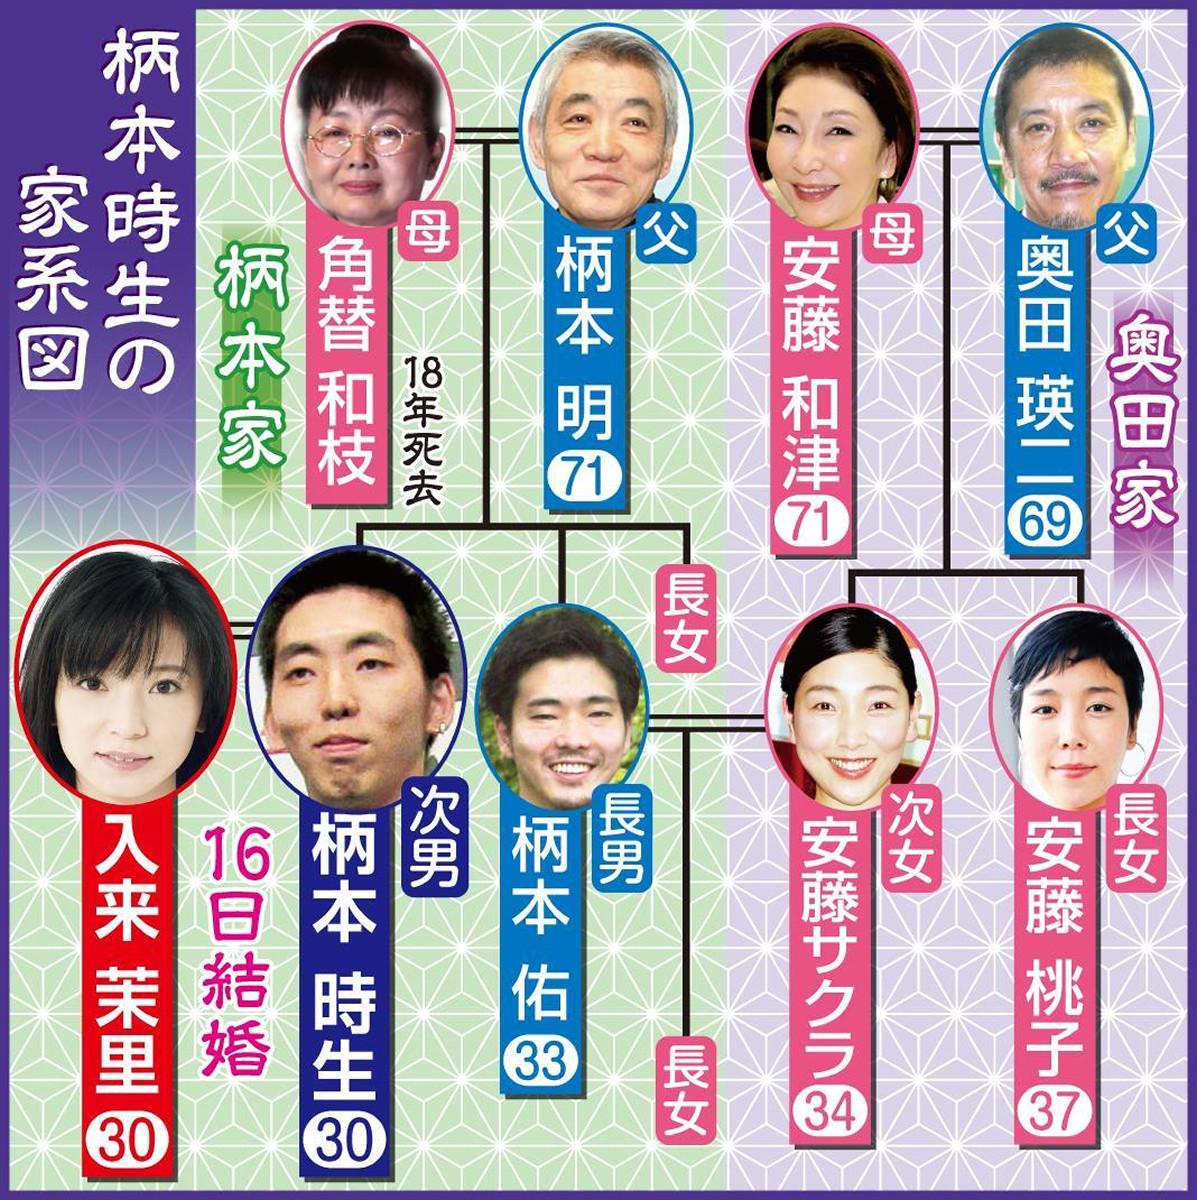 柄本時生の家系図